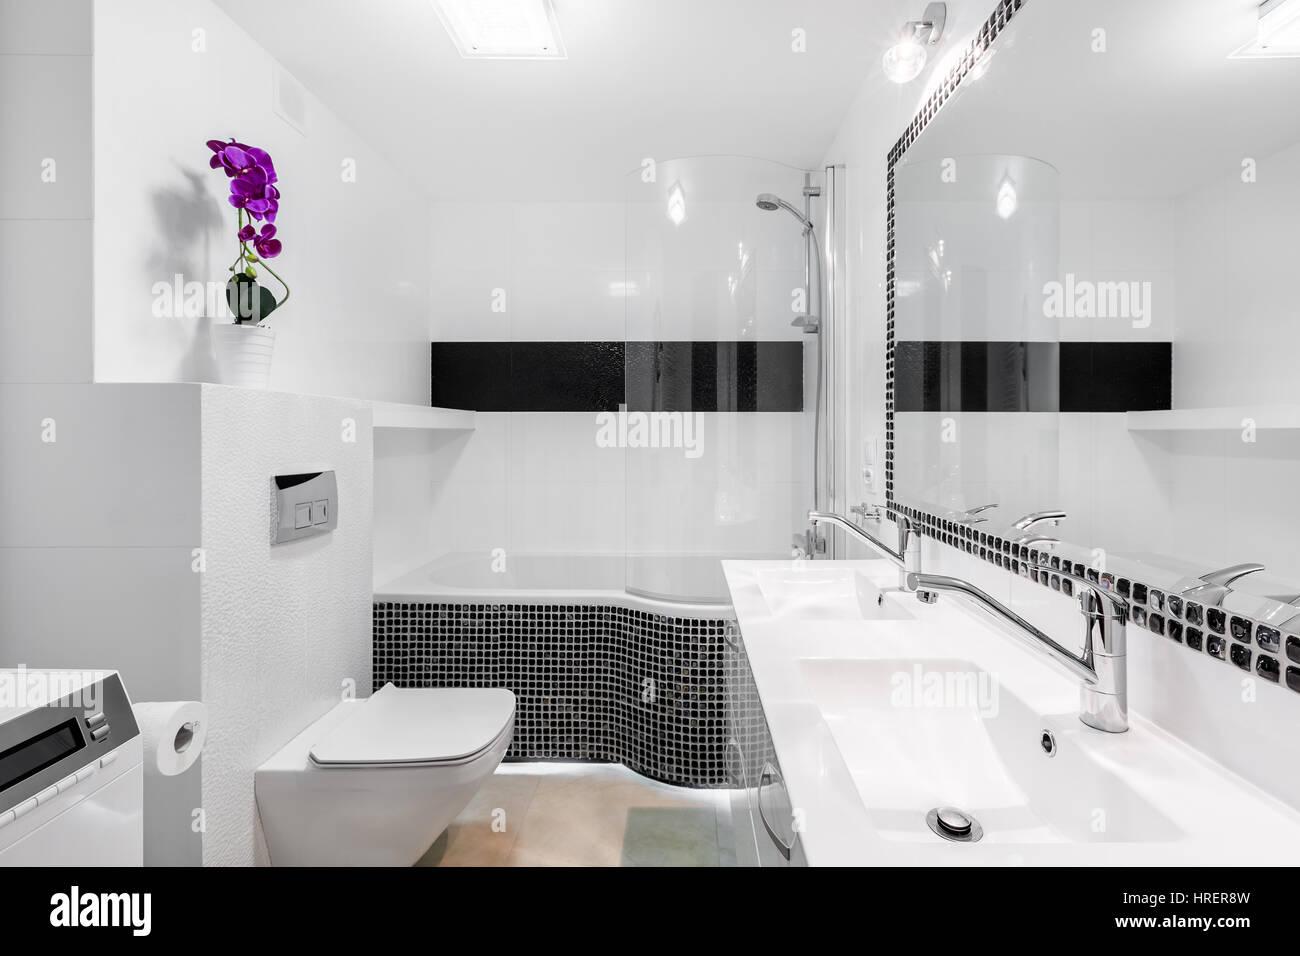 Bagno Con Mosaico Nero : Elegante bagno interno con moderno mosaico nero accenti e grande